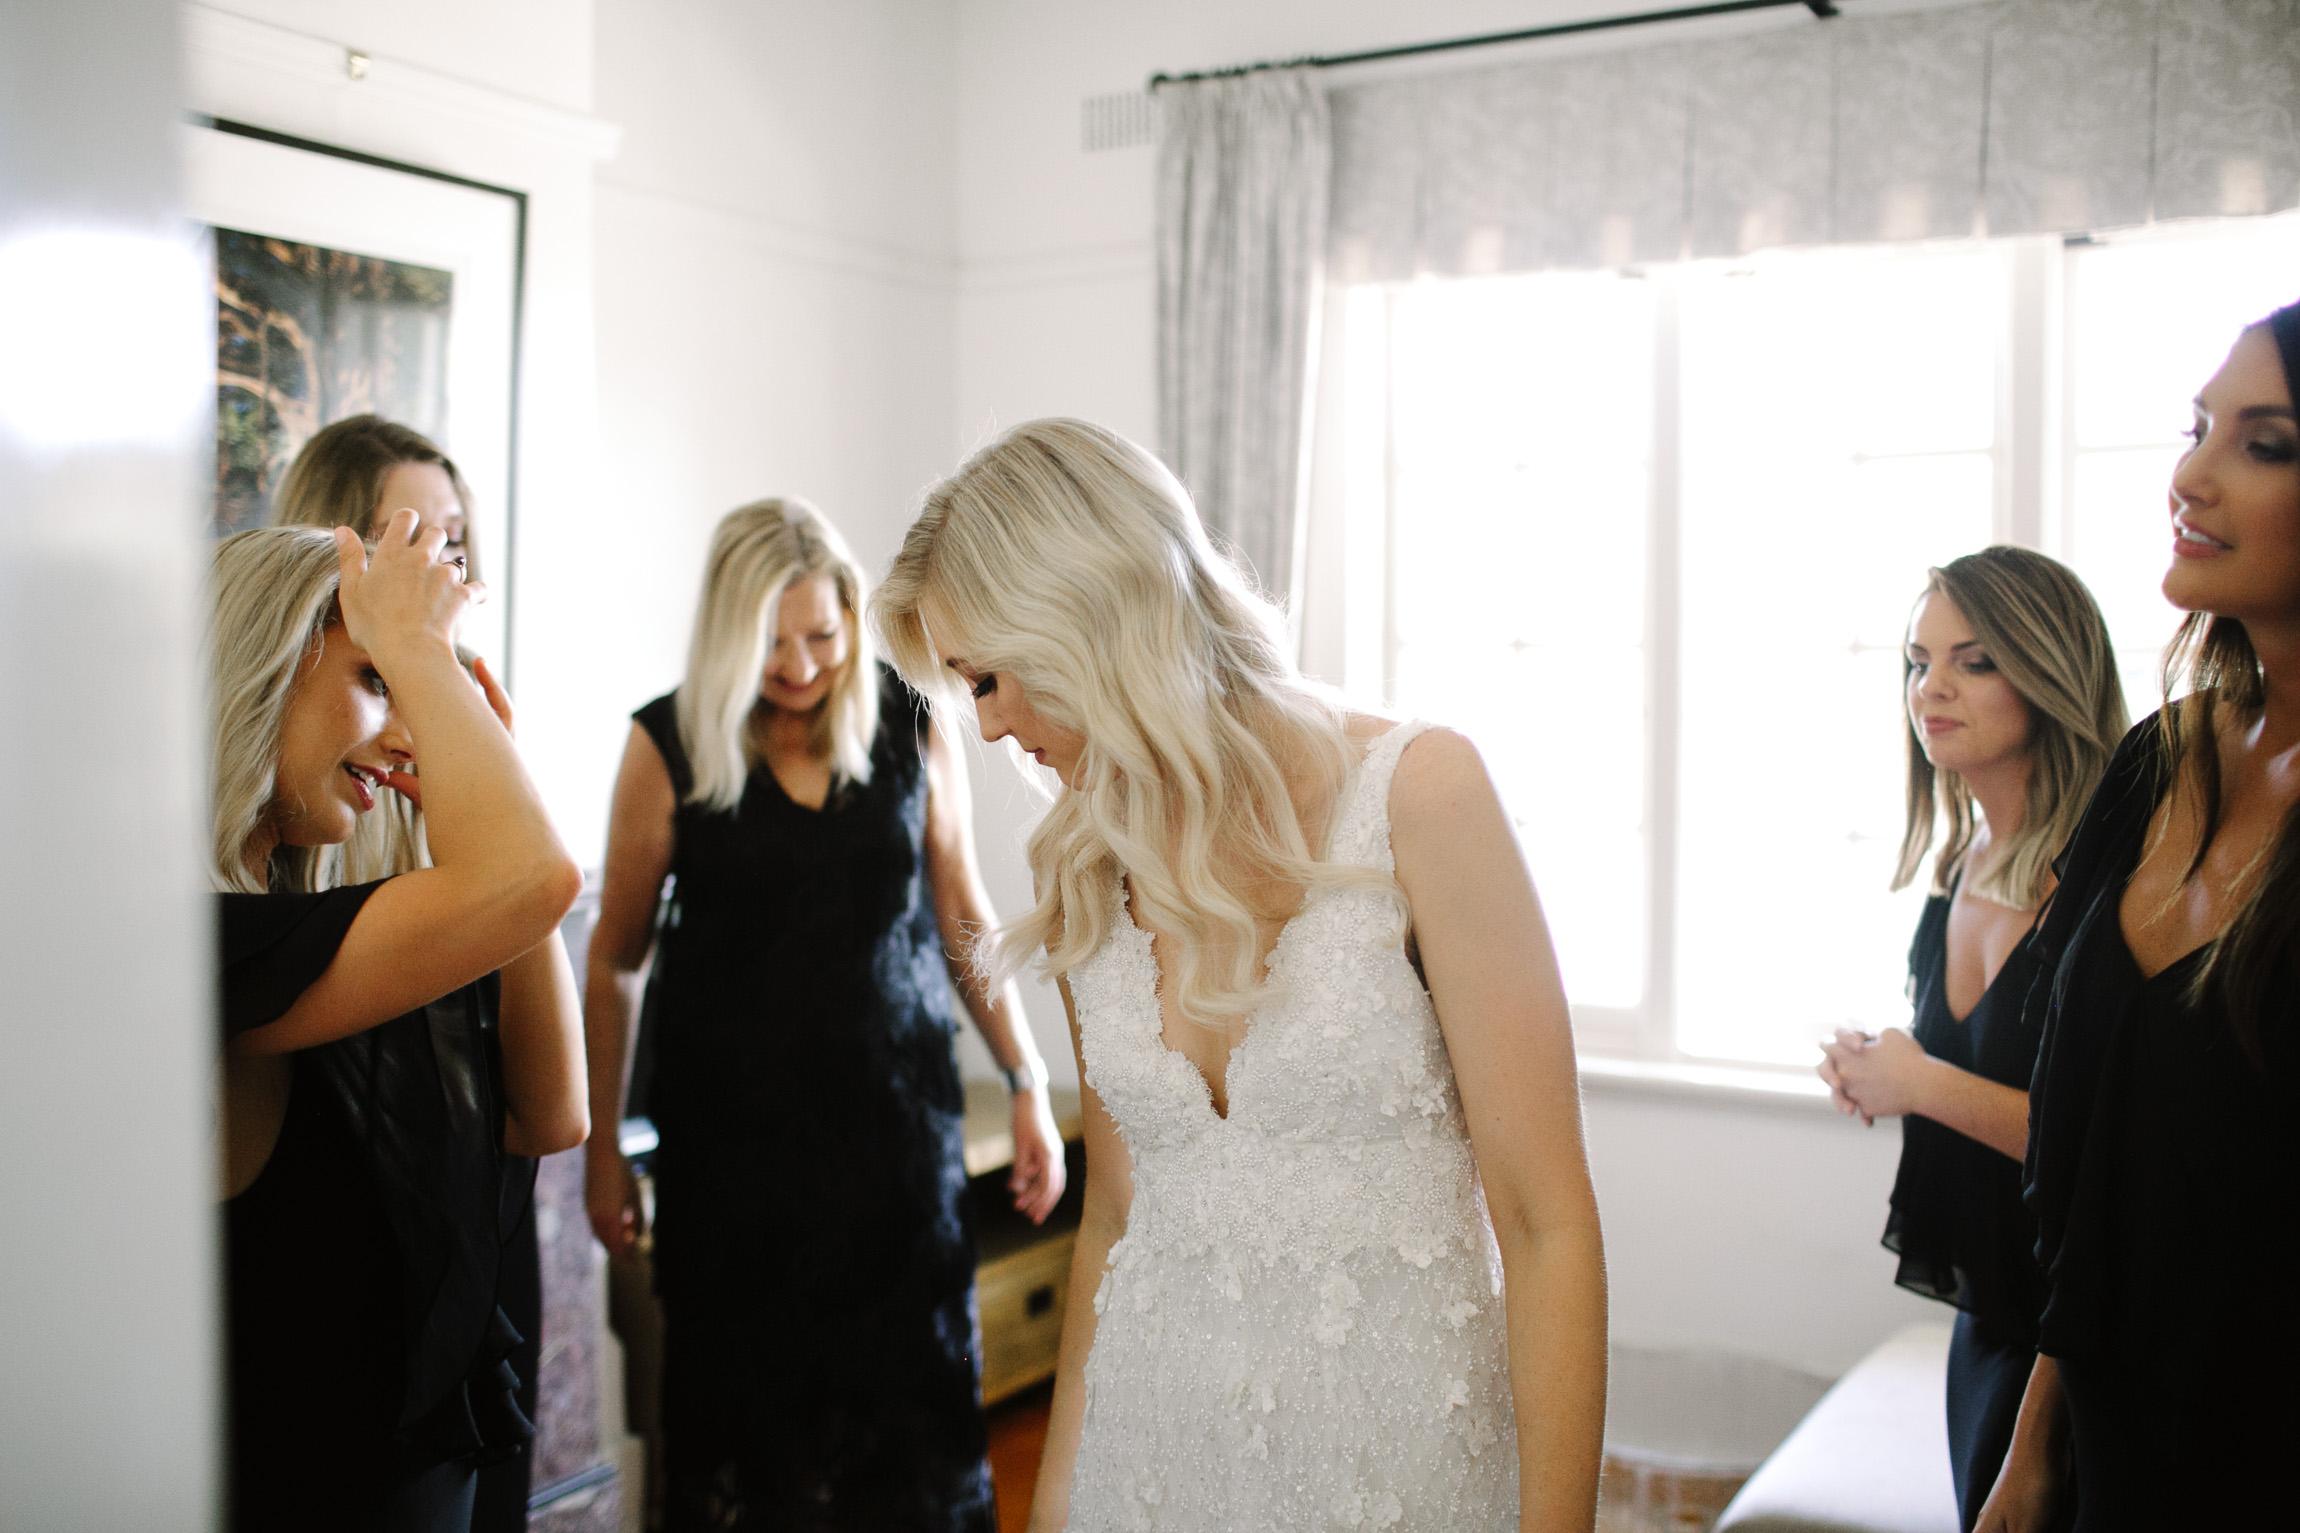 180223_justinaaron_wedding_charlotte_david_h-37.jpg